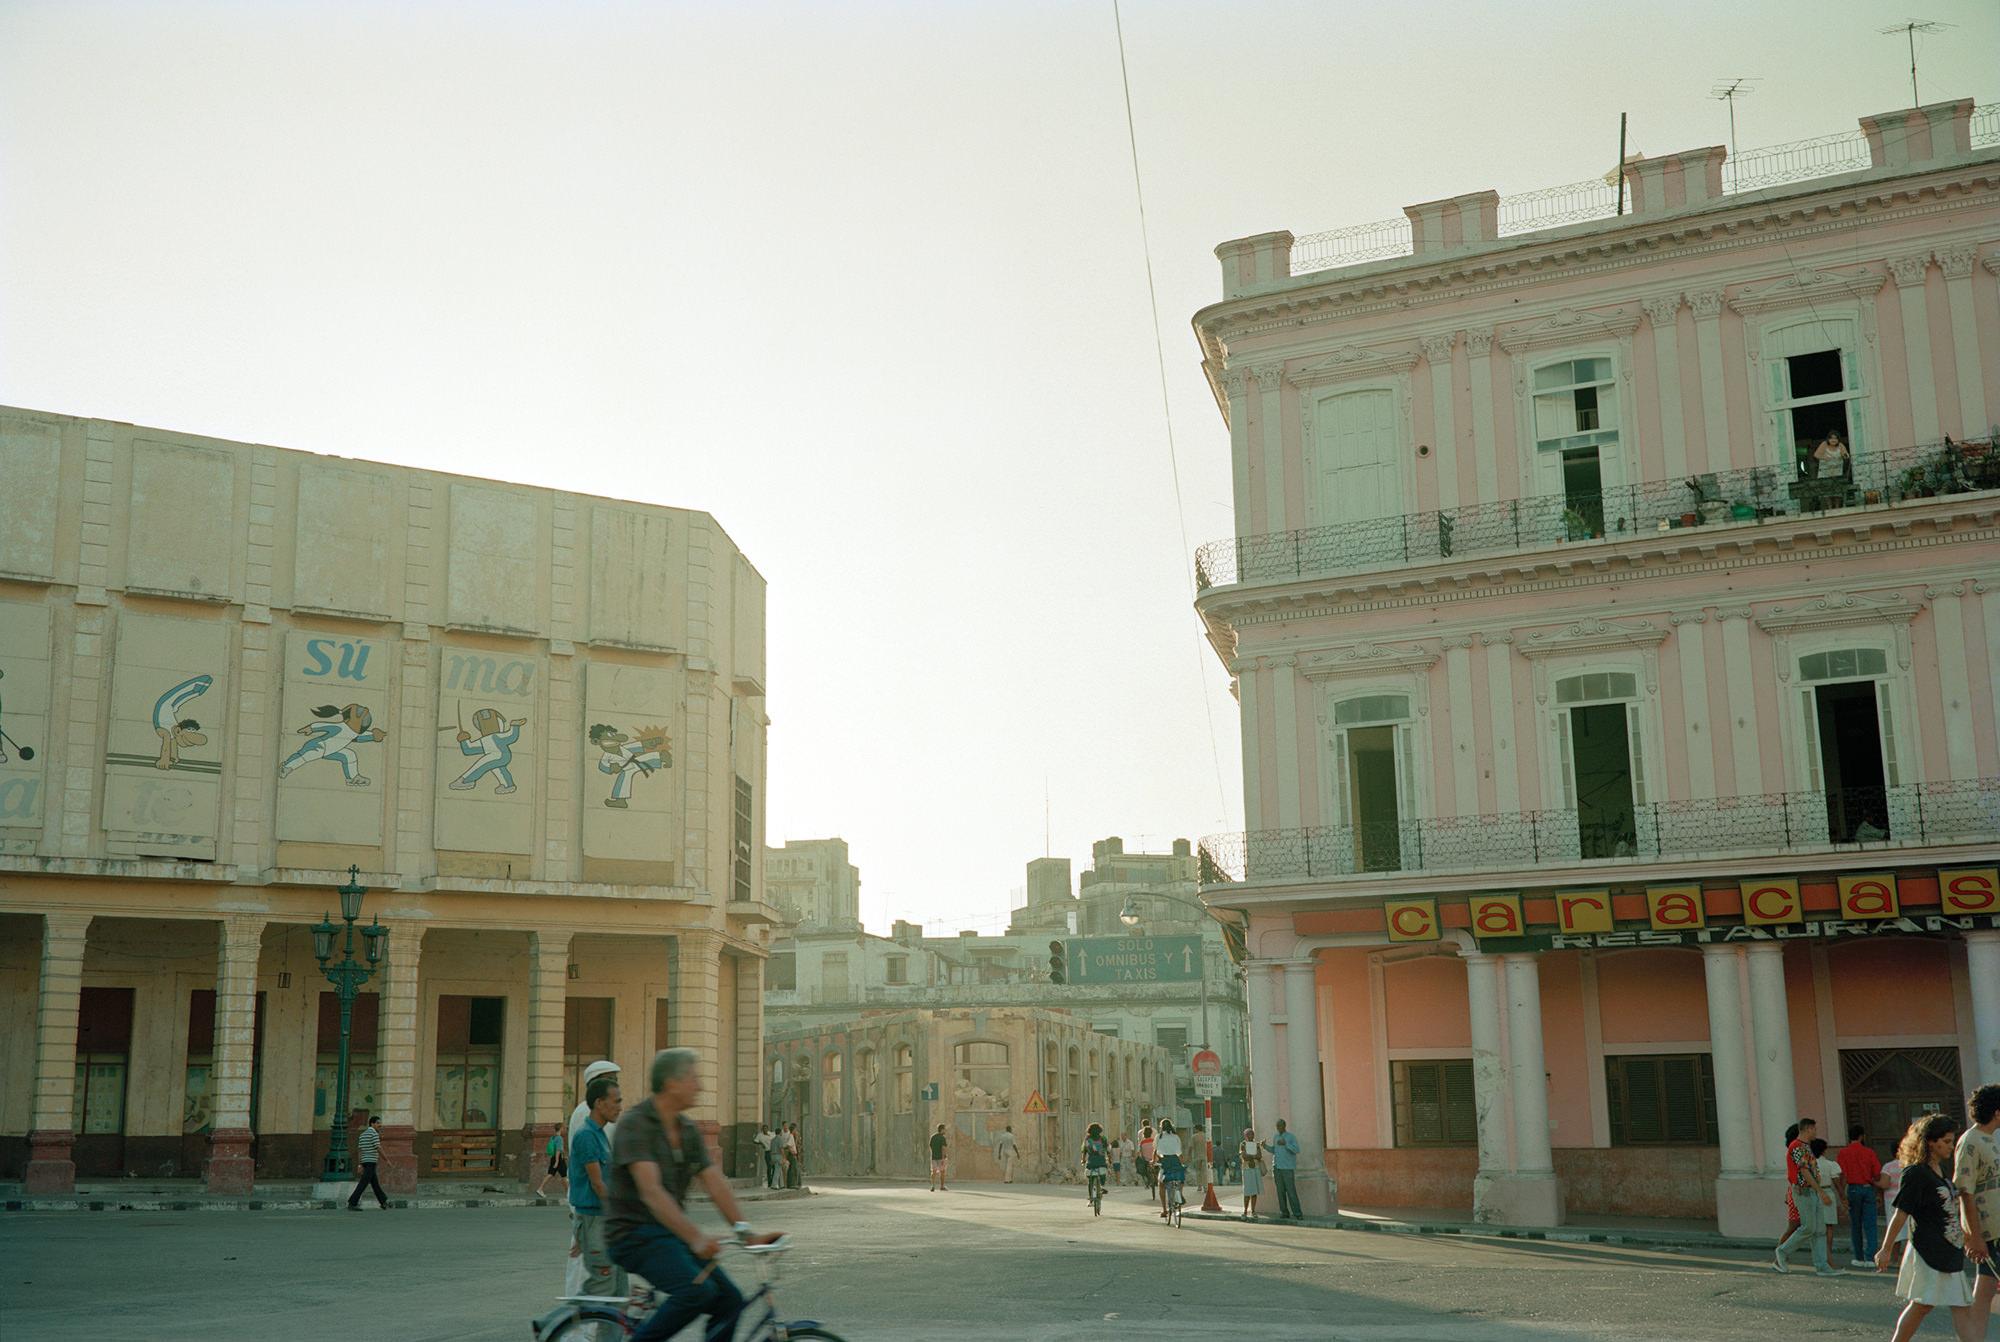 25_Paseo_de_Prado_y_Neptuno_Havana_20_x24_pigment_print_1993.jpg